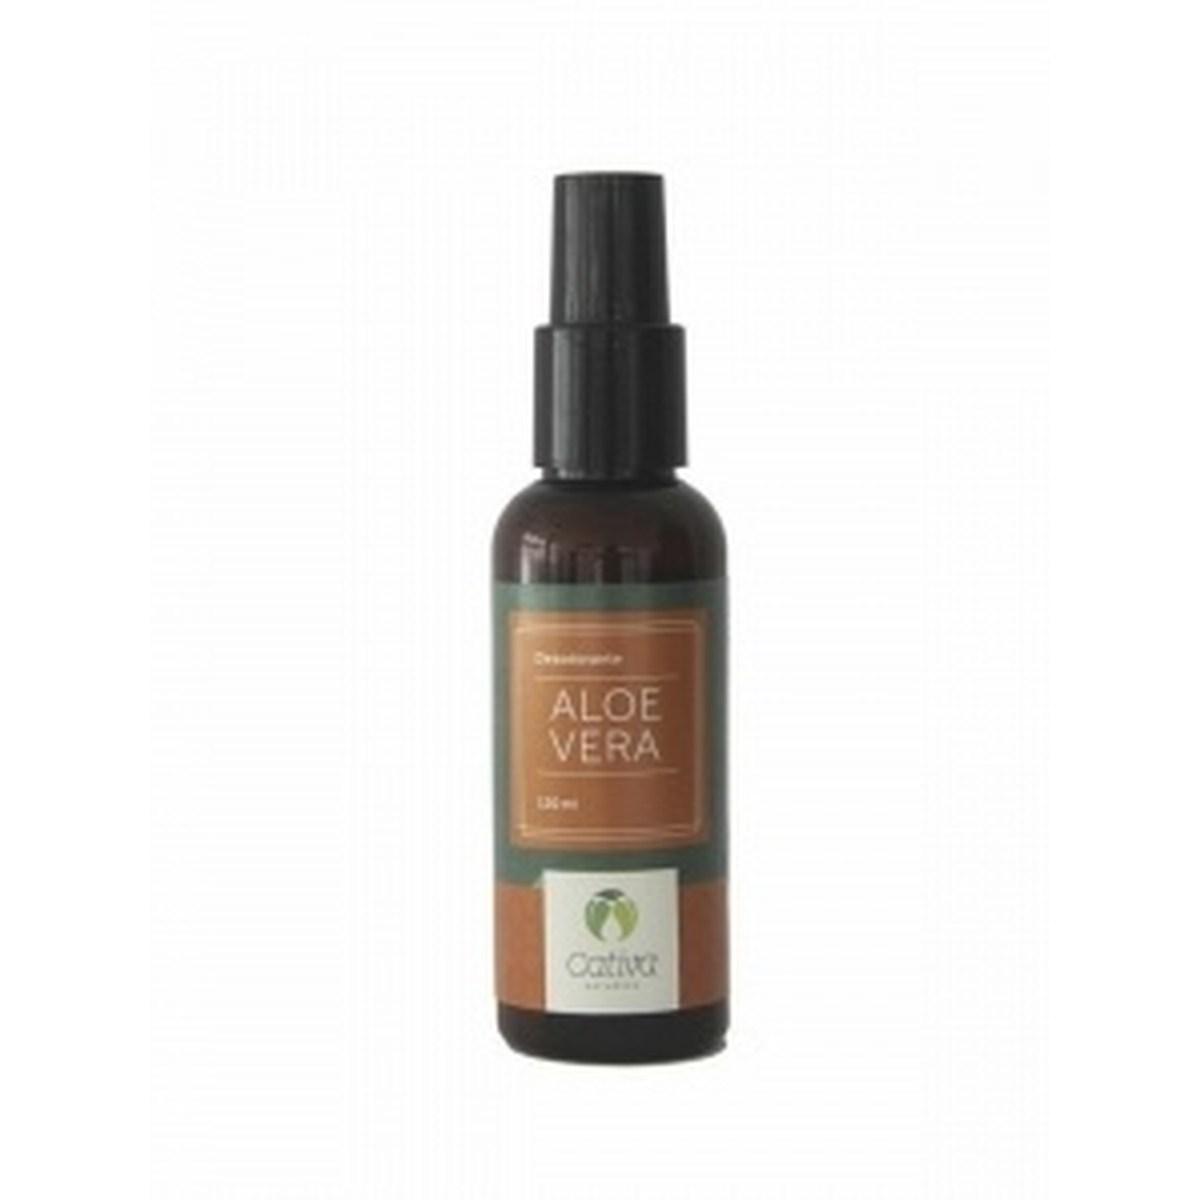 Desodorante Natural e Vegano Aloe Vera Cativa Natureza 120 ml